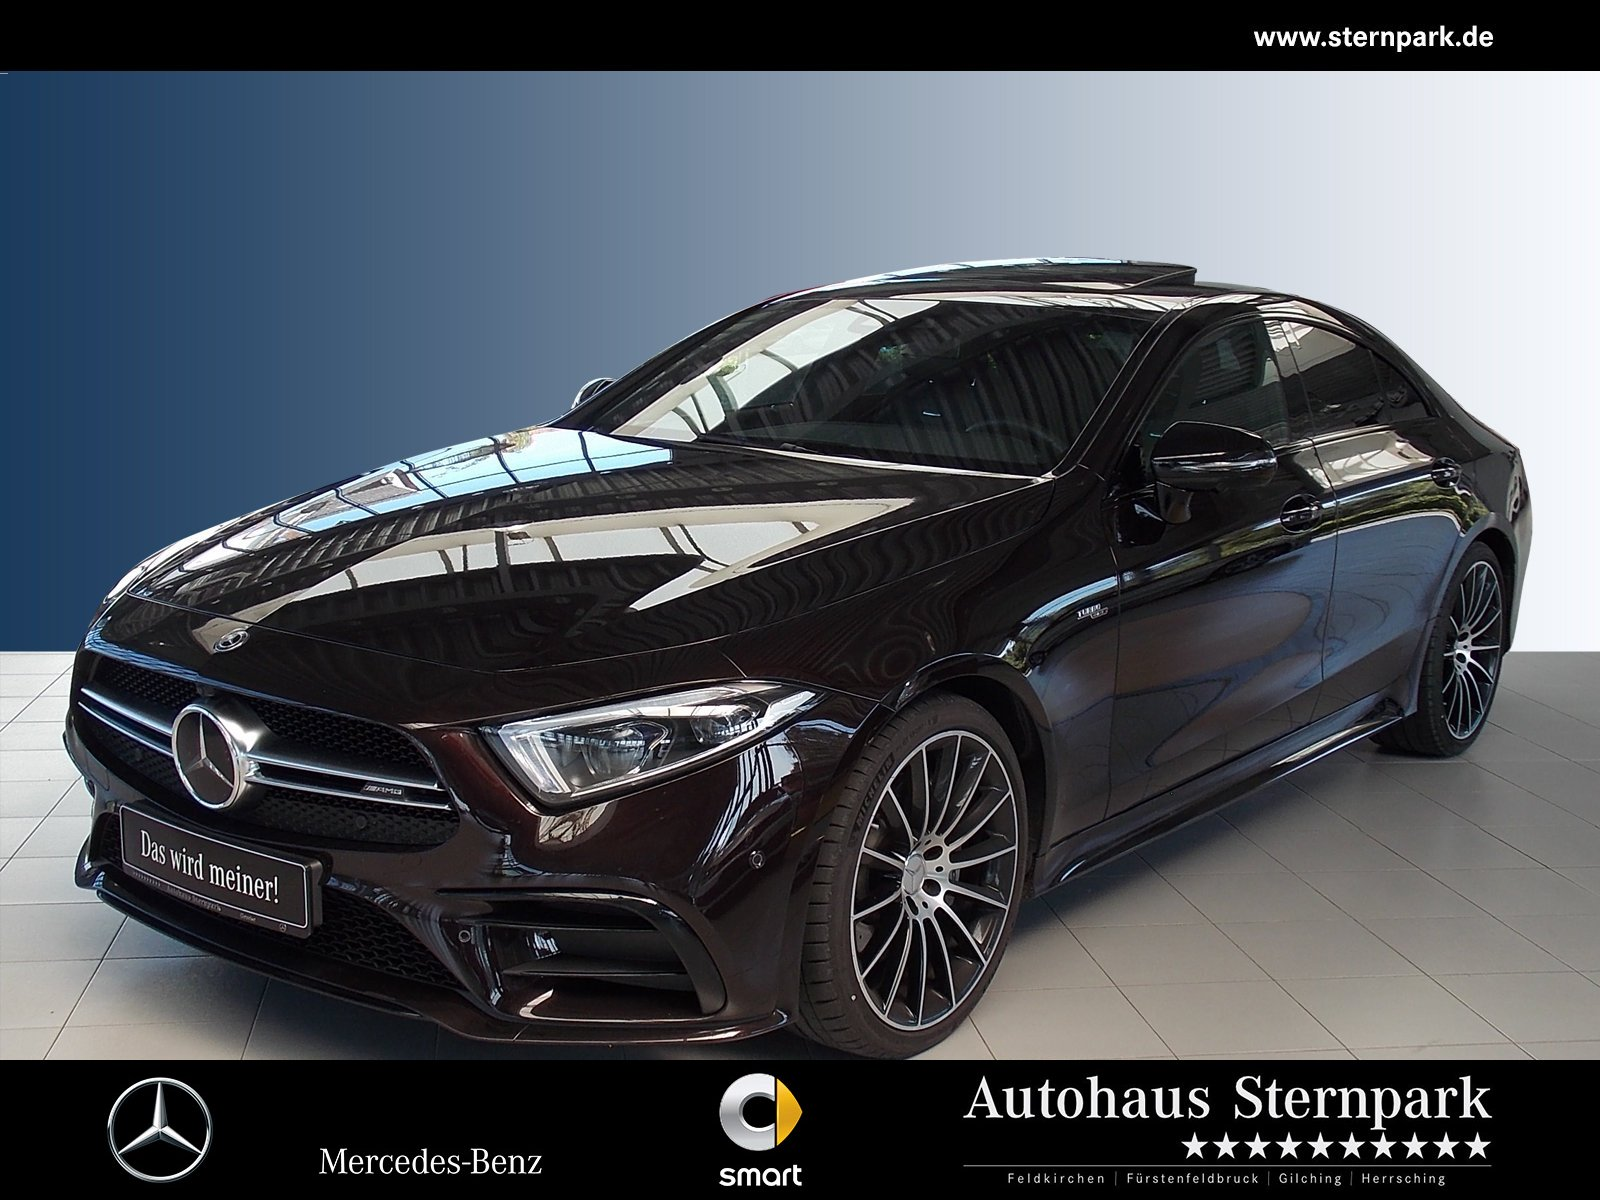 Mercedes-Benz CLS 53 AMG 4M+ Comand+360°+Night+LED+SHD+Nappa++, Jahr 2019, Benzin